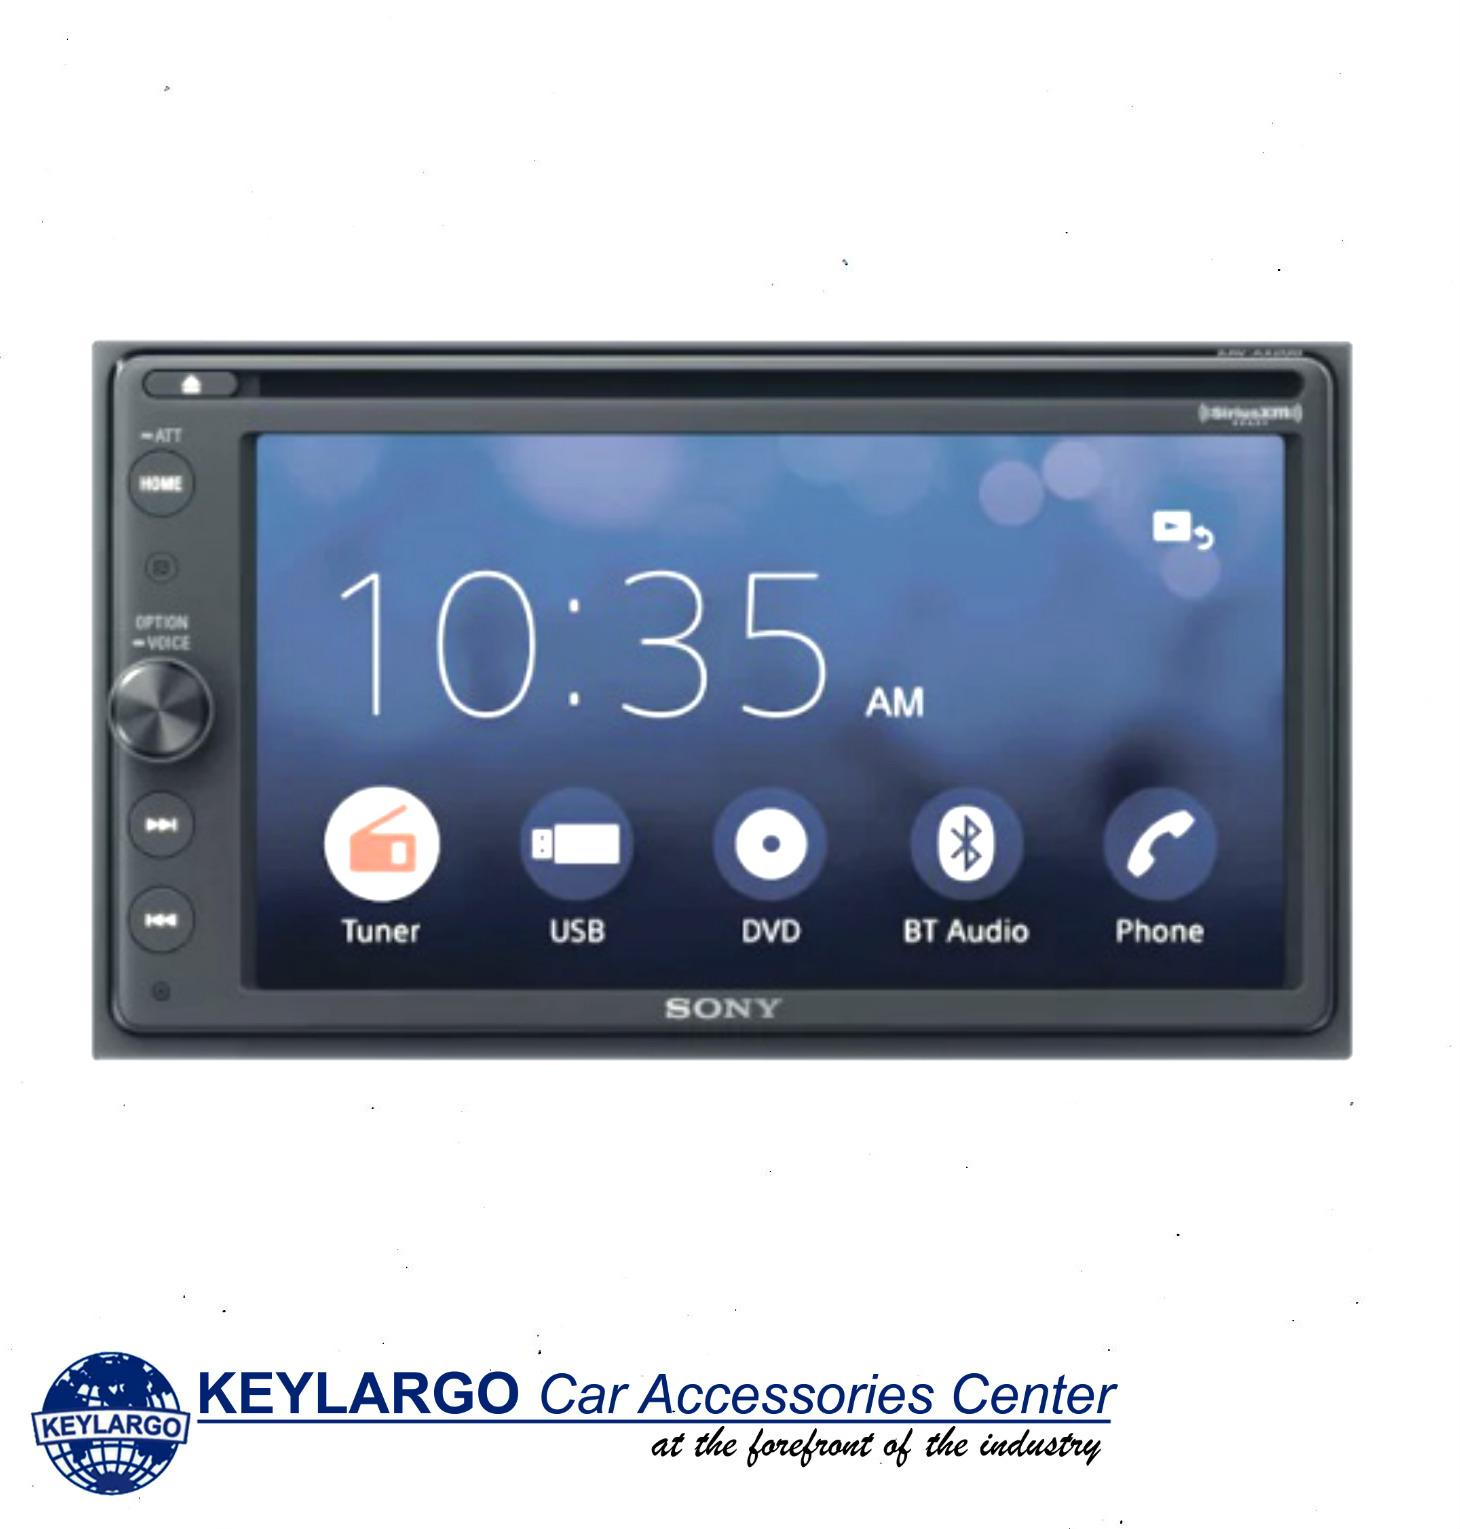 Keylargo SONY XAV-AX200 LCD DVD RECEIVER